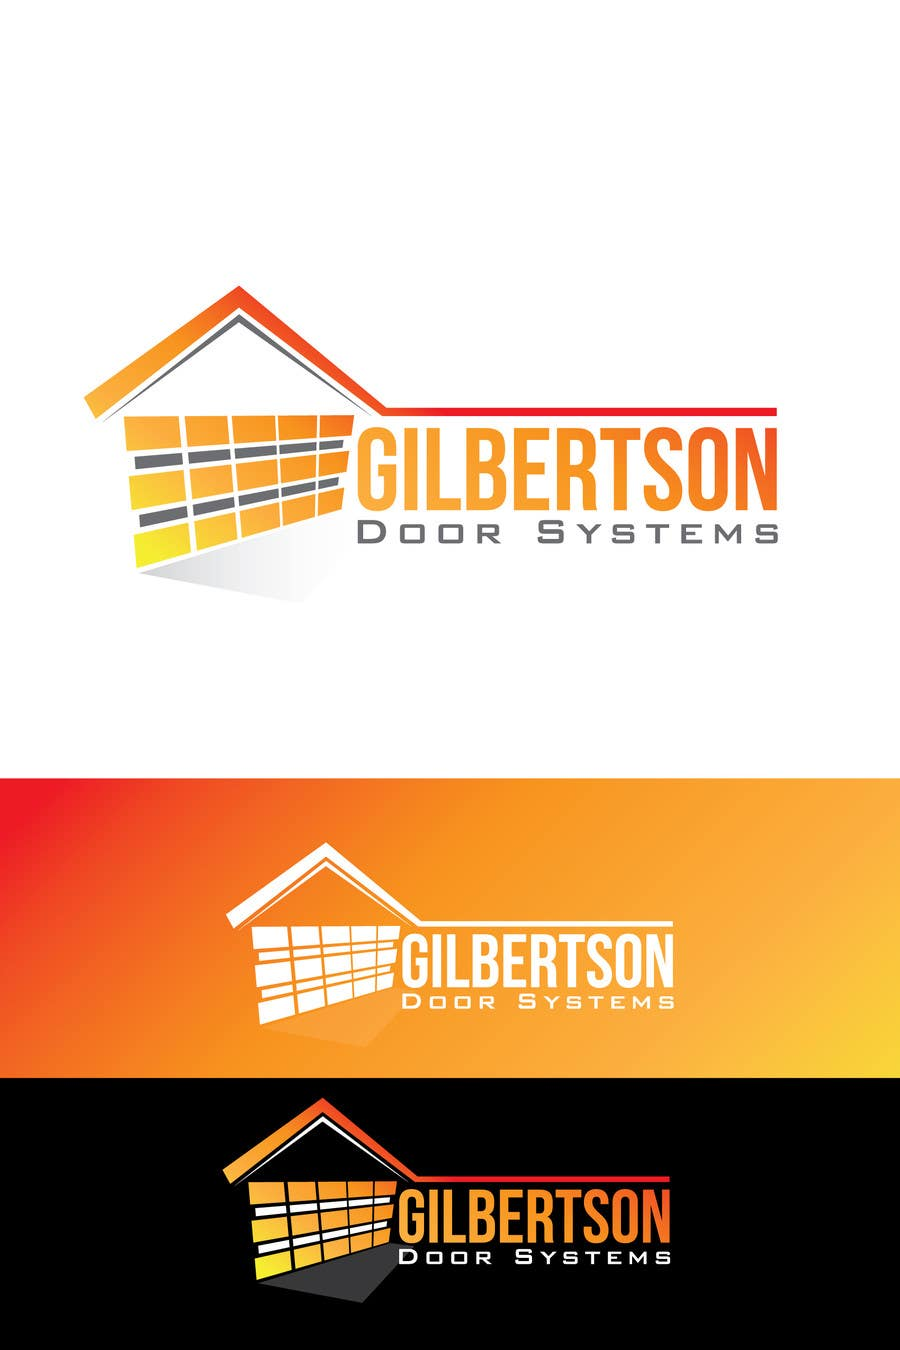 Kilpailutyö #33 kilpailussa Design a Logo for Gilbertson Door Systems